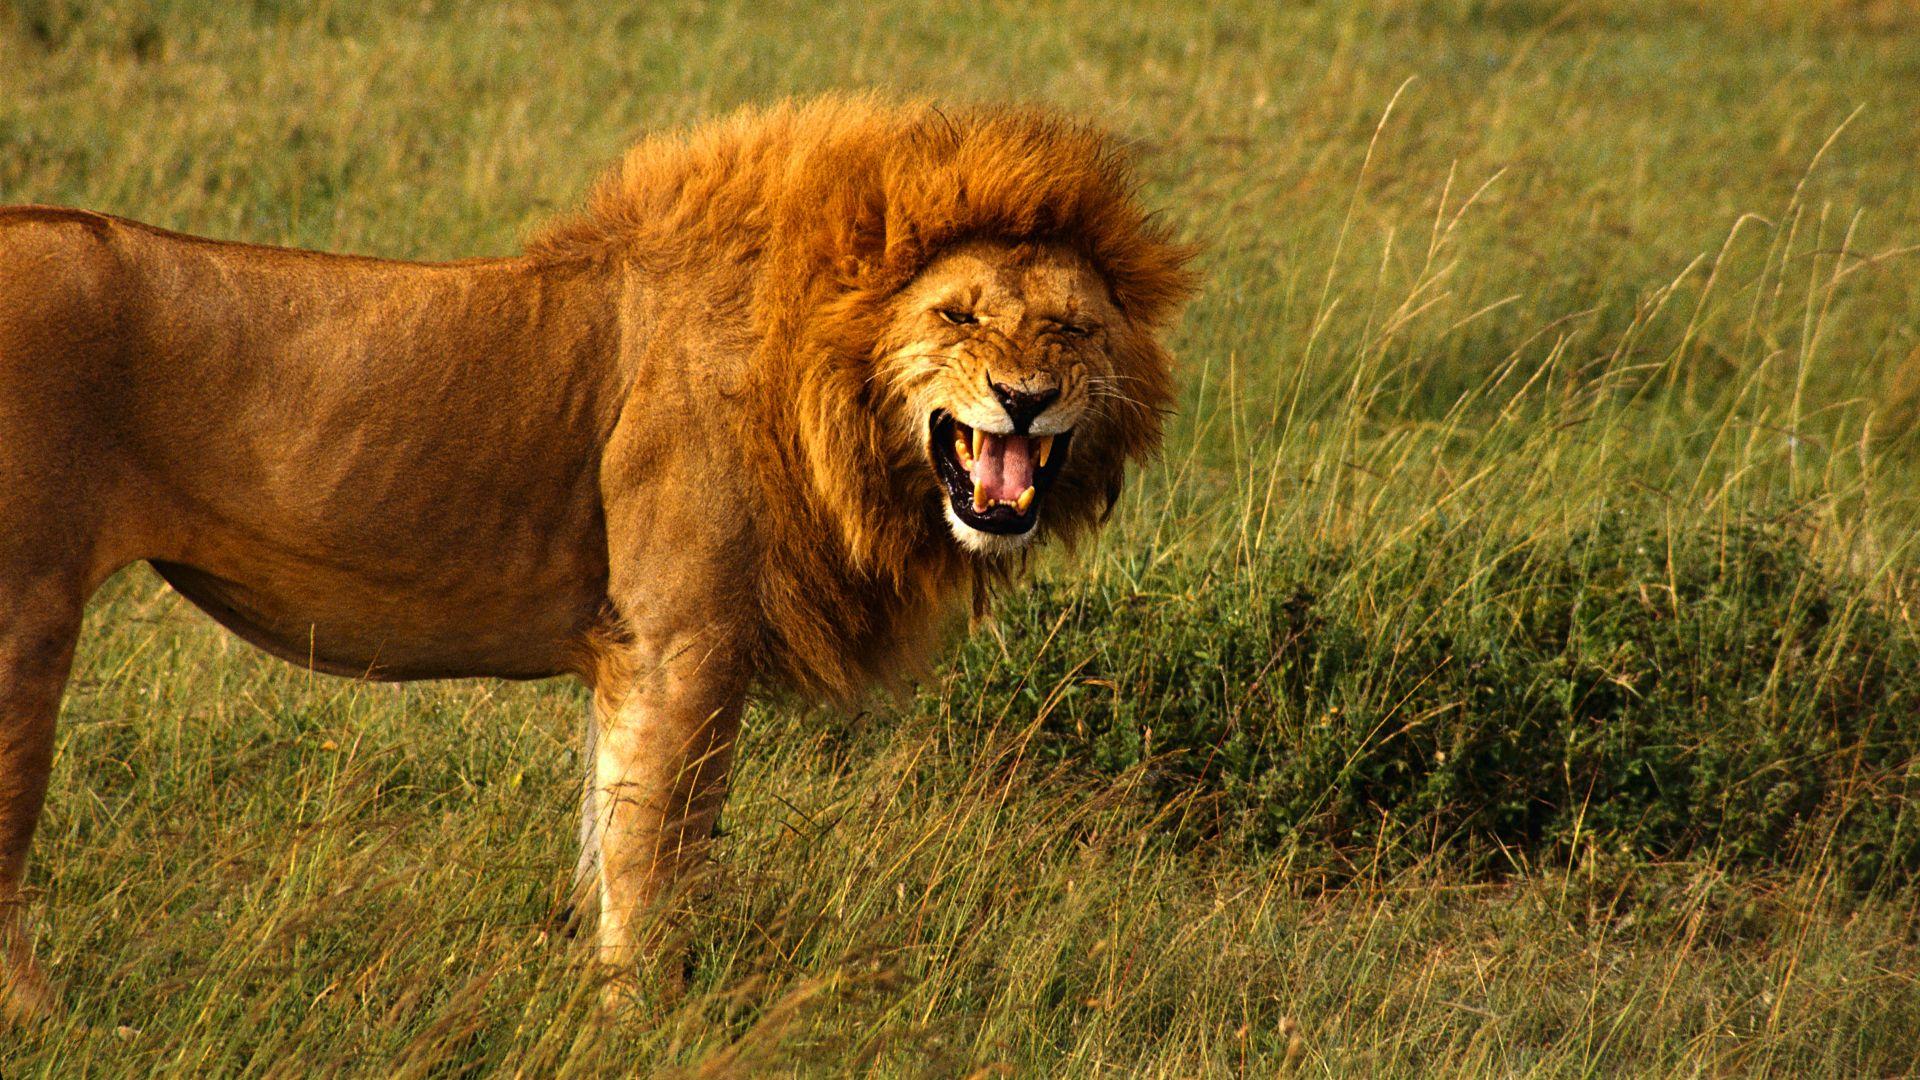 Grassland Animals Feline Lions Nature Wallpaper 639346 Wallbase Cc Lion Facts Fun Facts About Lions Lion Wallpaper